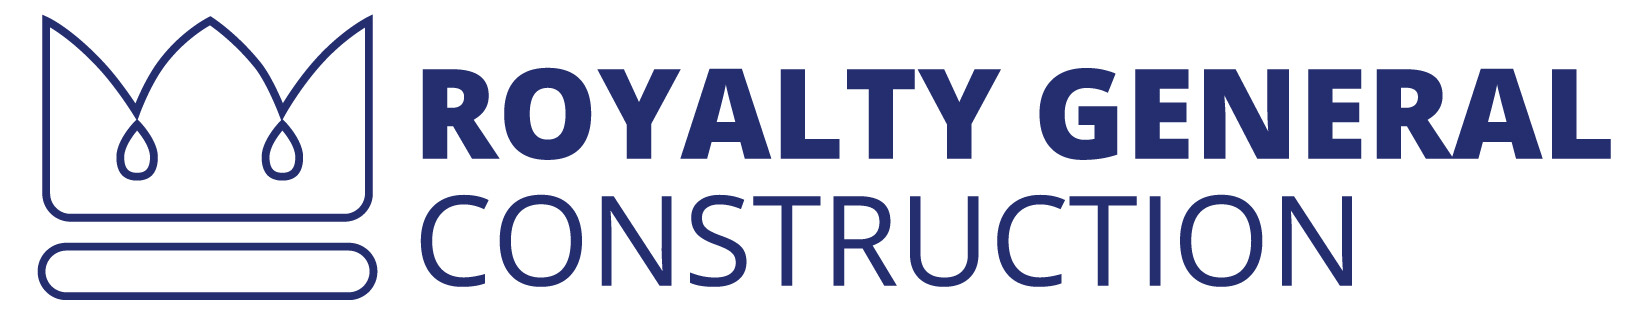 RoyaltyGeneral_logo_1C_rgb.jpg